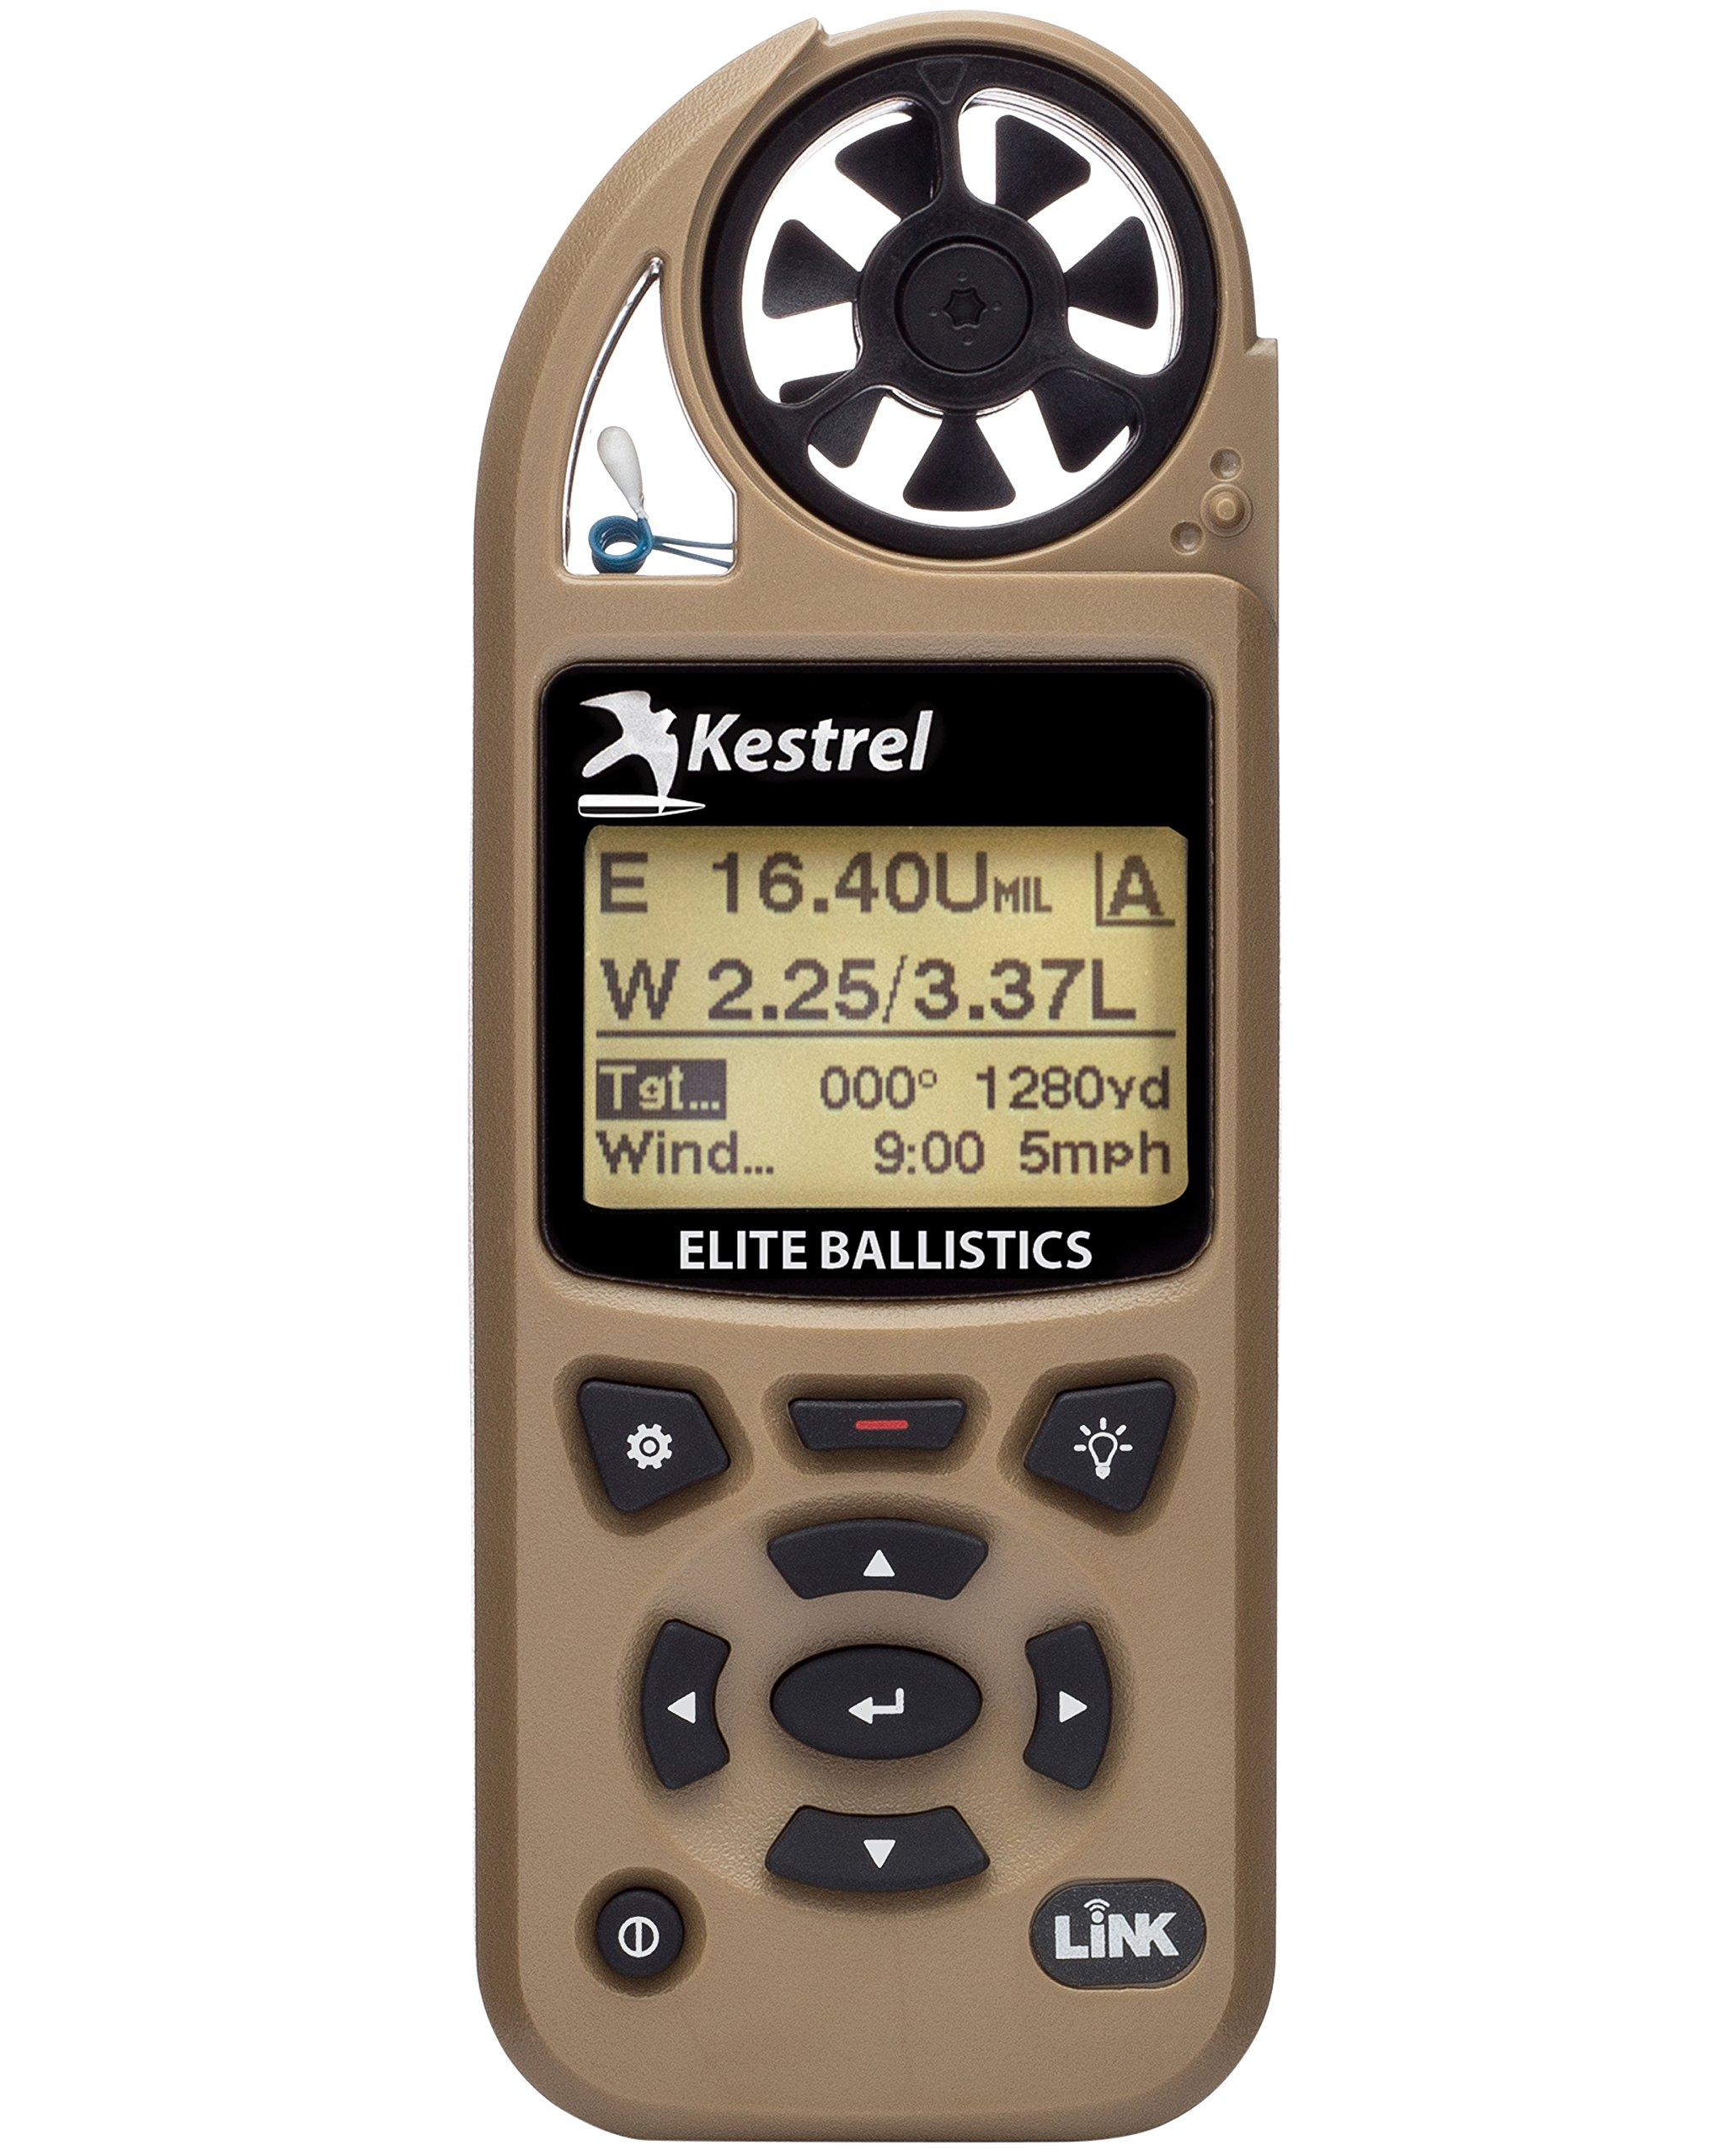 Kestrel 5700 Elite Weather Meter with Applied Ballistics and Bluetooth Link, Tan